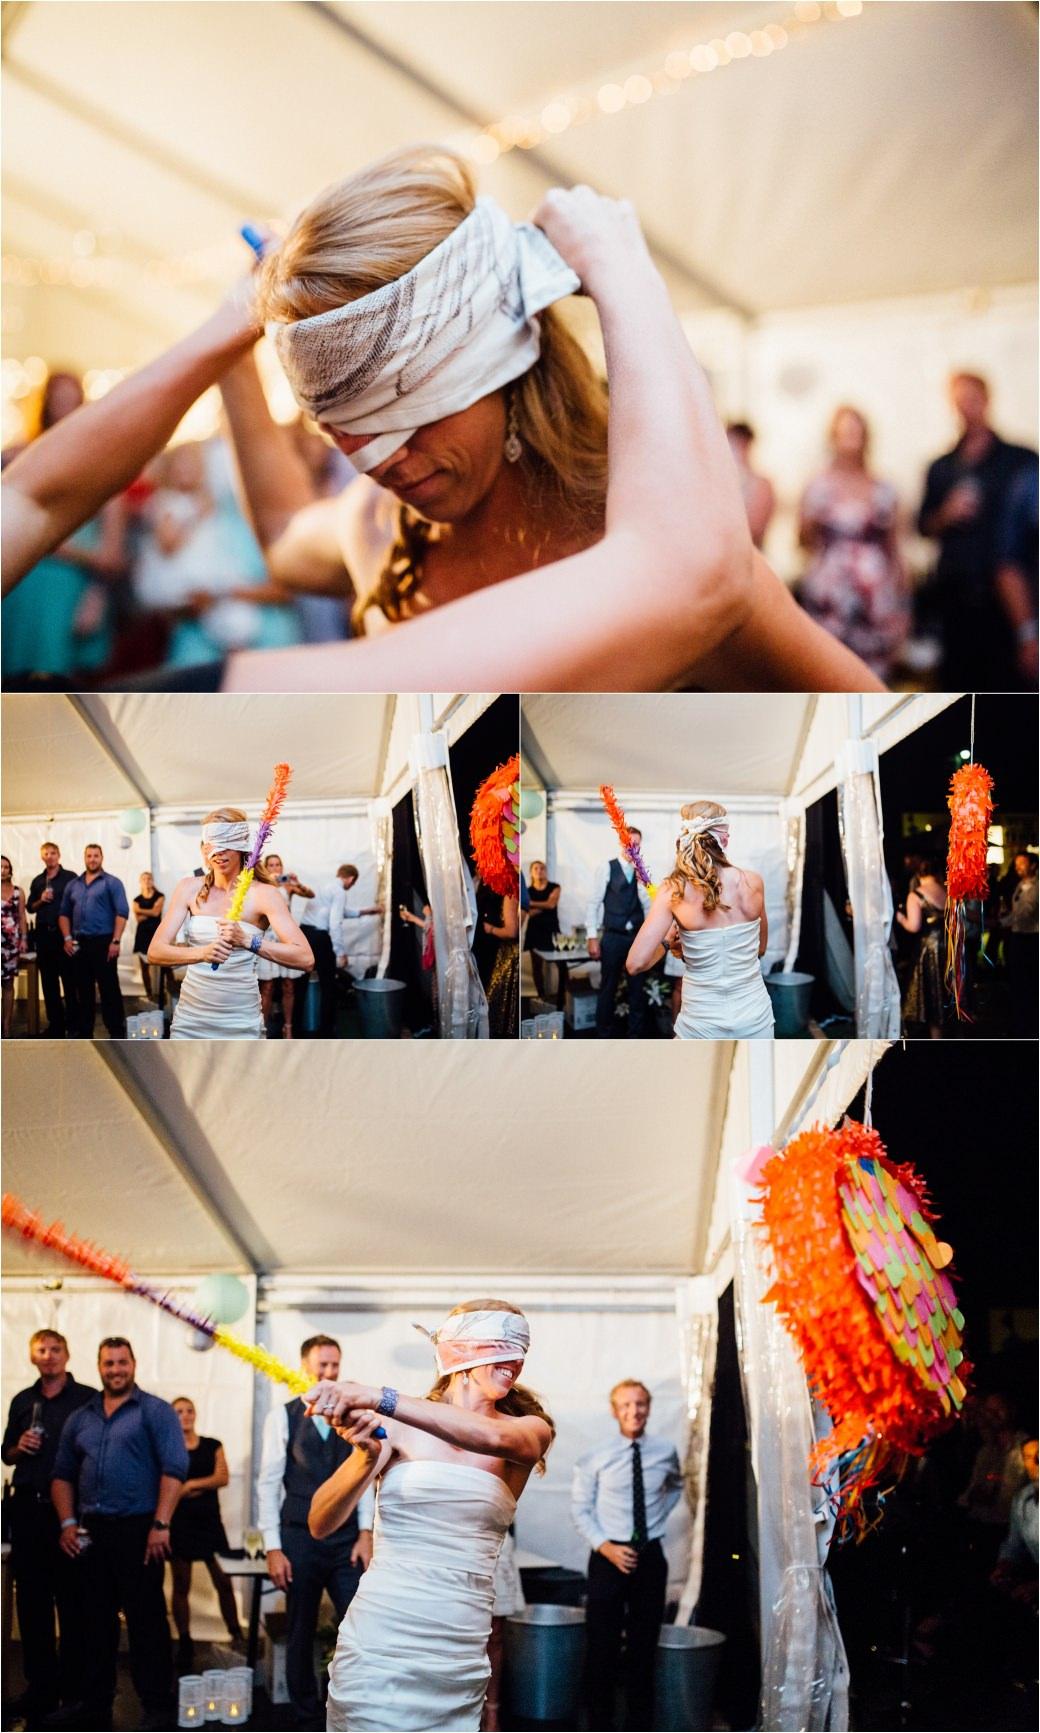 hanwin triathlon taco truck sorrento australian beach witsup wedding day melbourne wedding hyggelig photography090